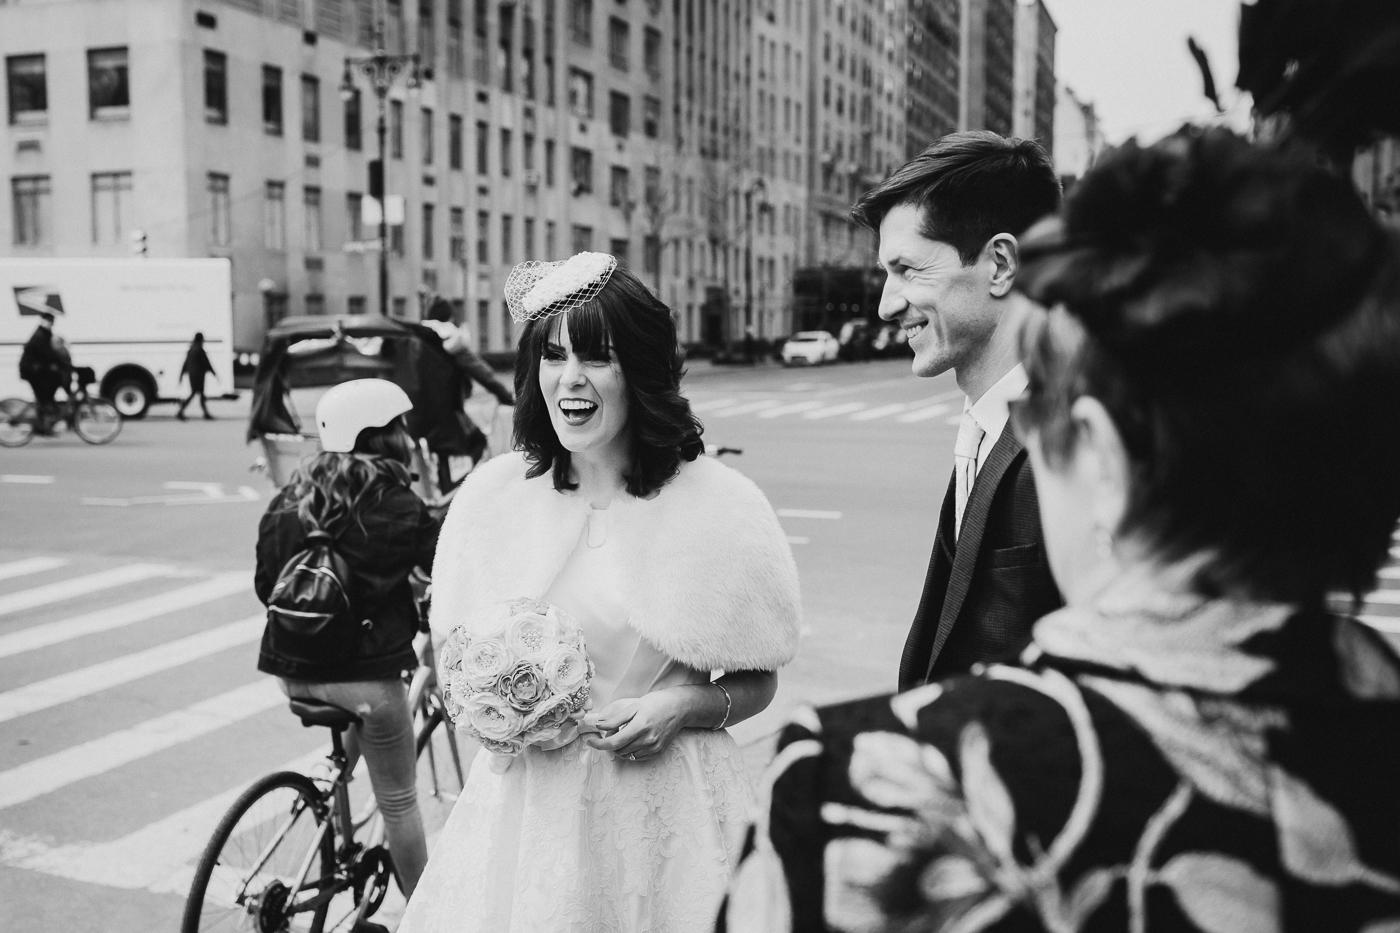 Ladies-Pavilion-Central-Park-NYC-Documentary-Elopement-Wedding-Photographer-12.jpg